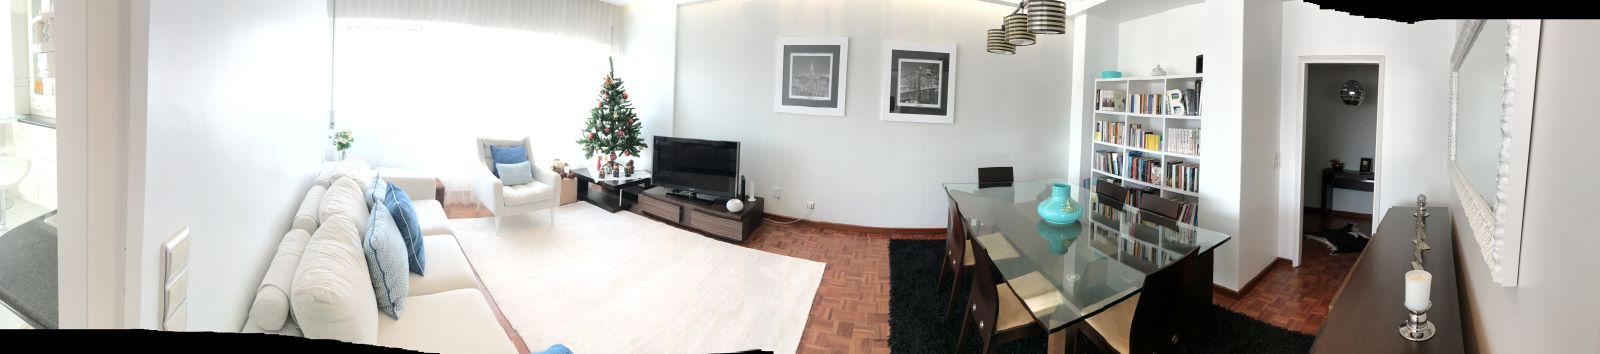 Apartamento T4 renovado no centro de Leiria%1/2